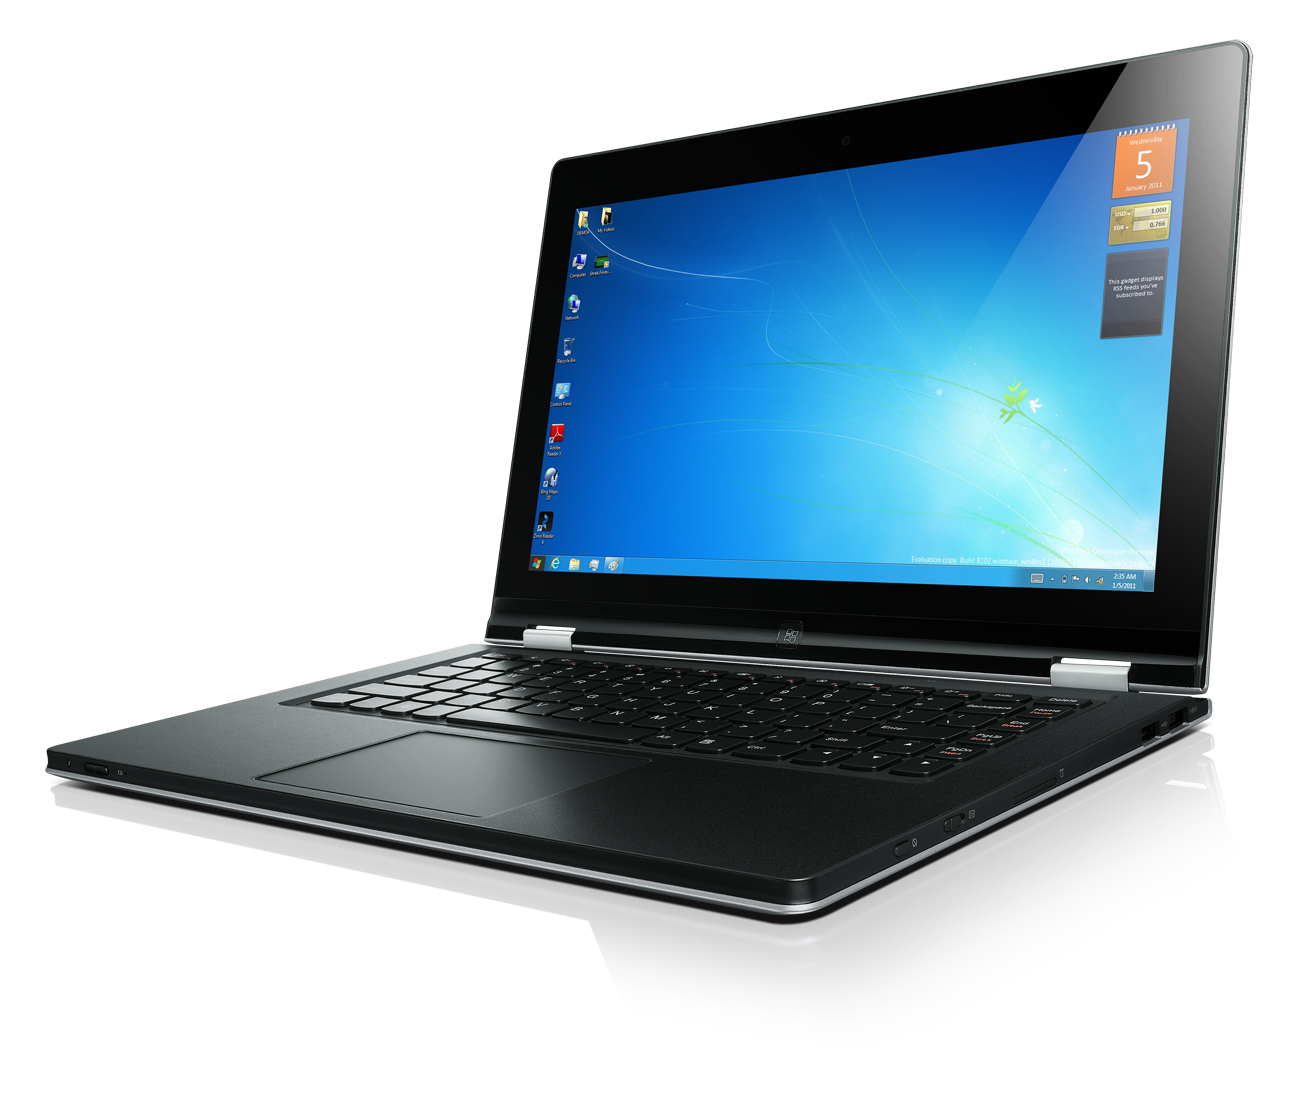 Tablet it s an ultrabook it s the lenovo ideapad yoga pcworld